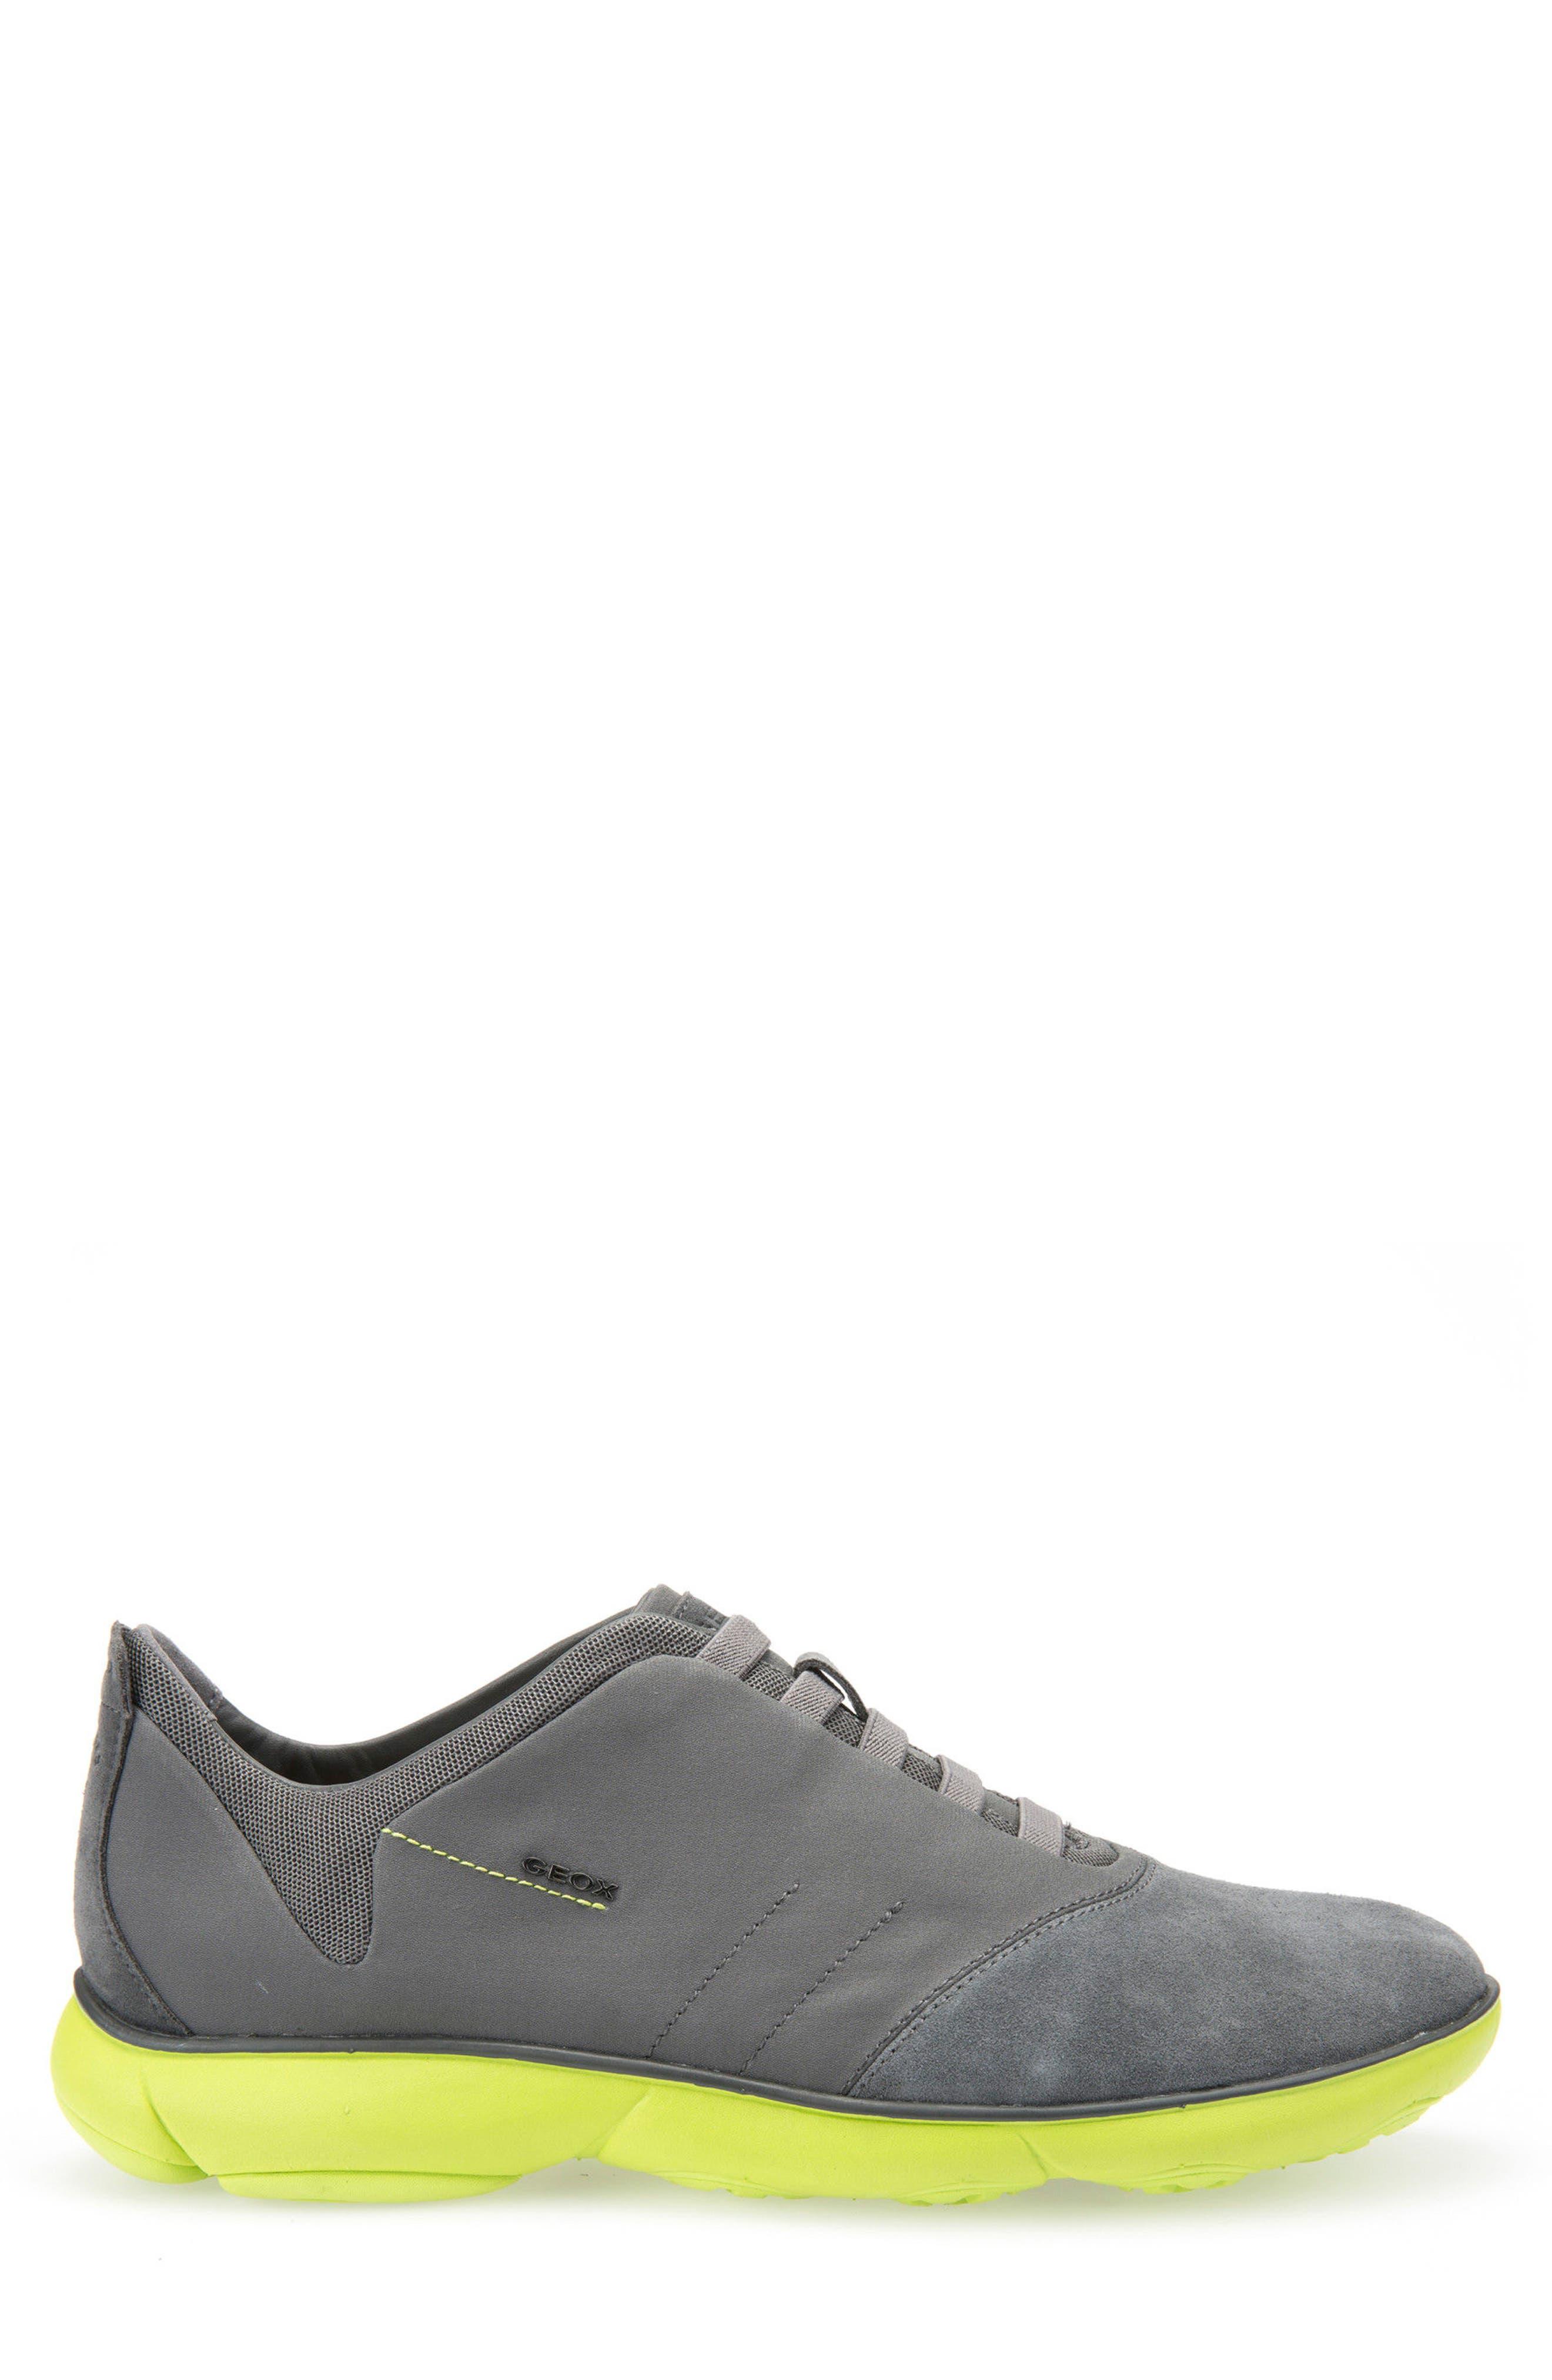 Nebula 26 Sneaker,                             Alternate thumbnail 5, color,